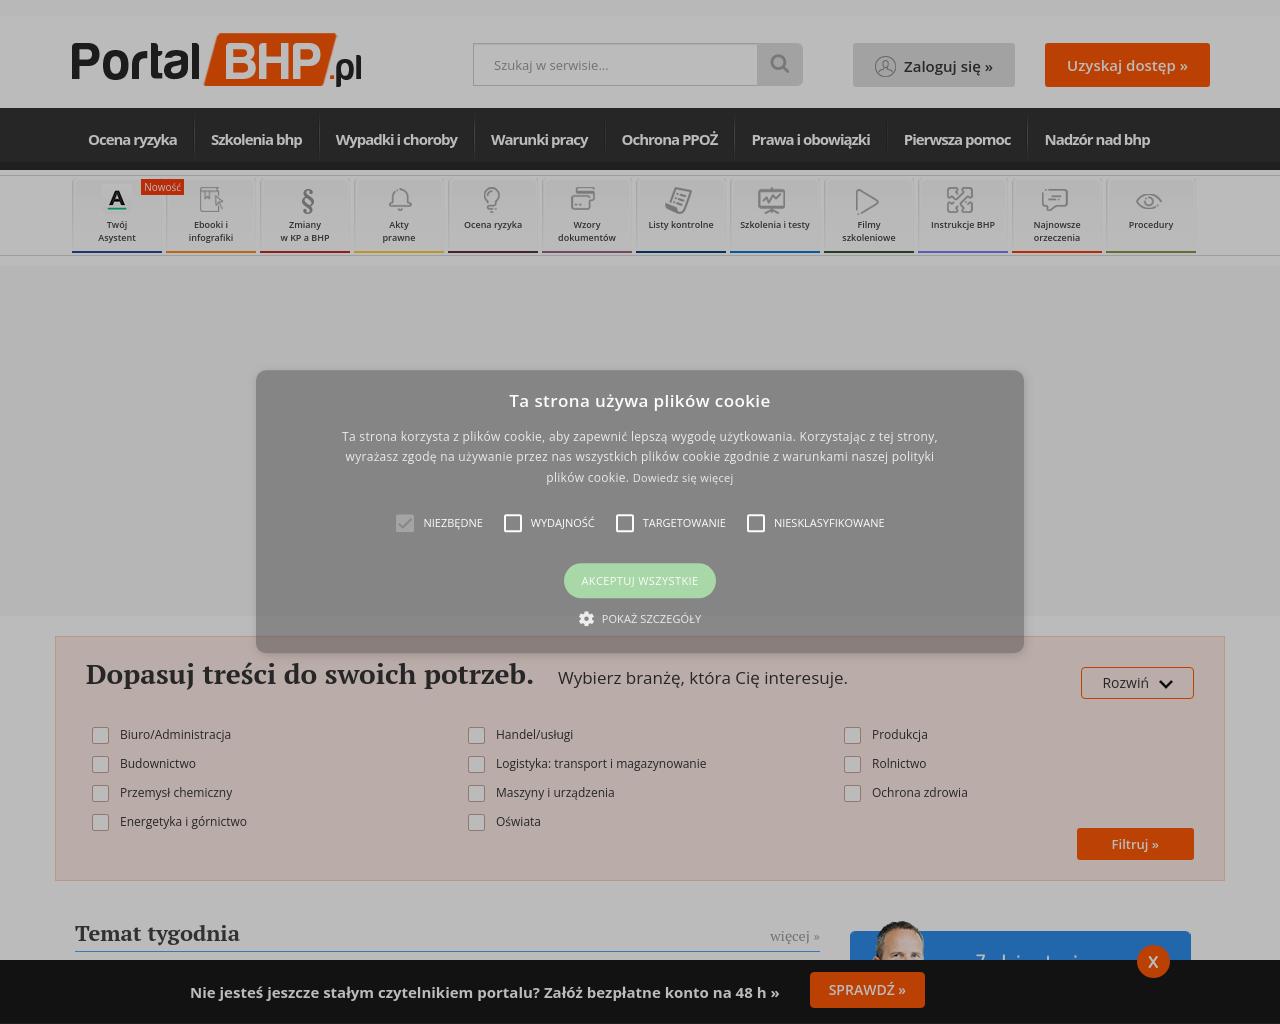 portalbhp.pl